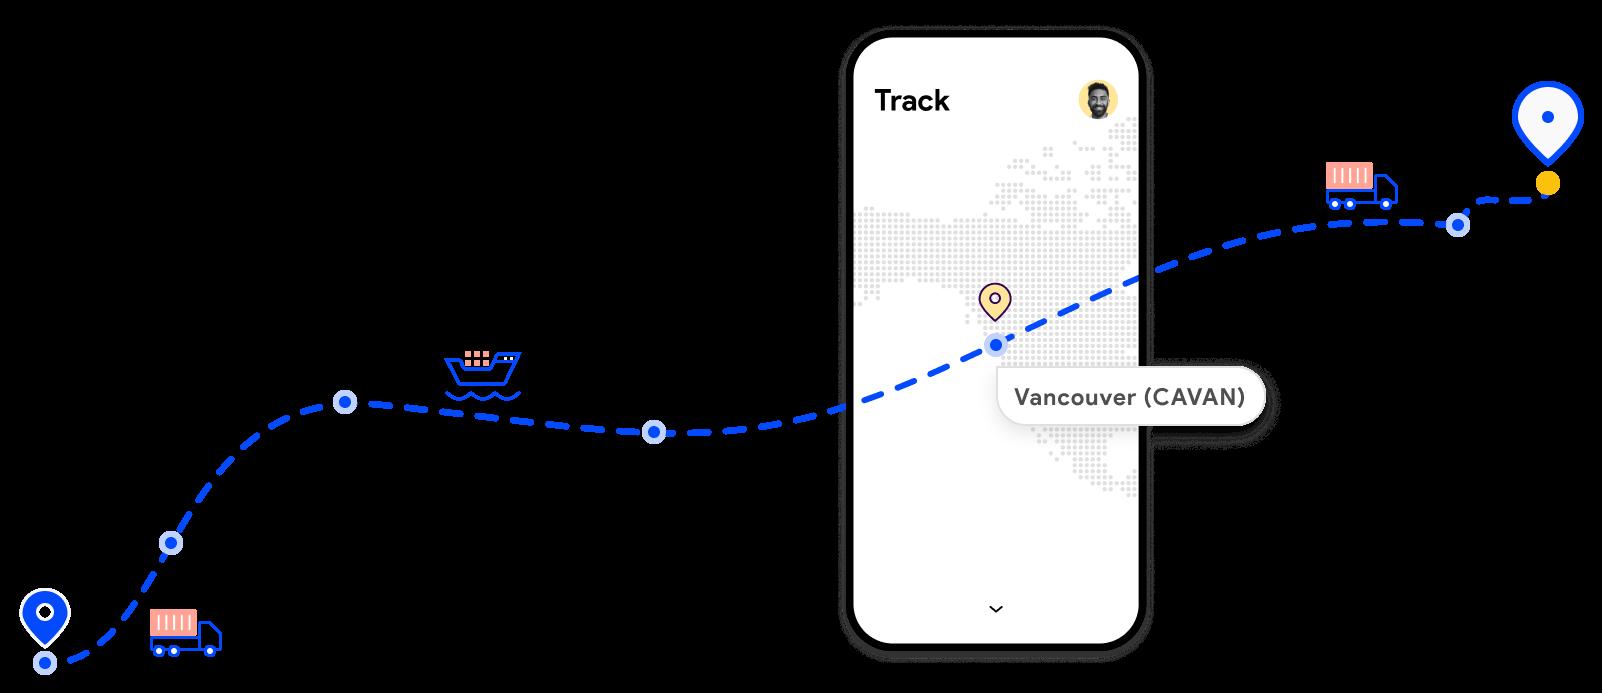 Track your shipment milestones